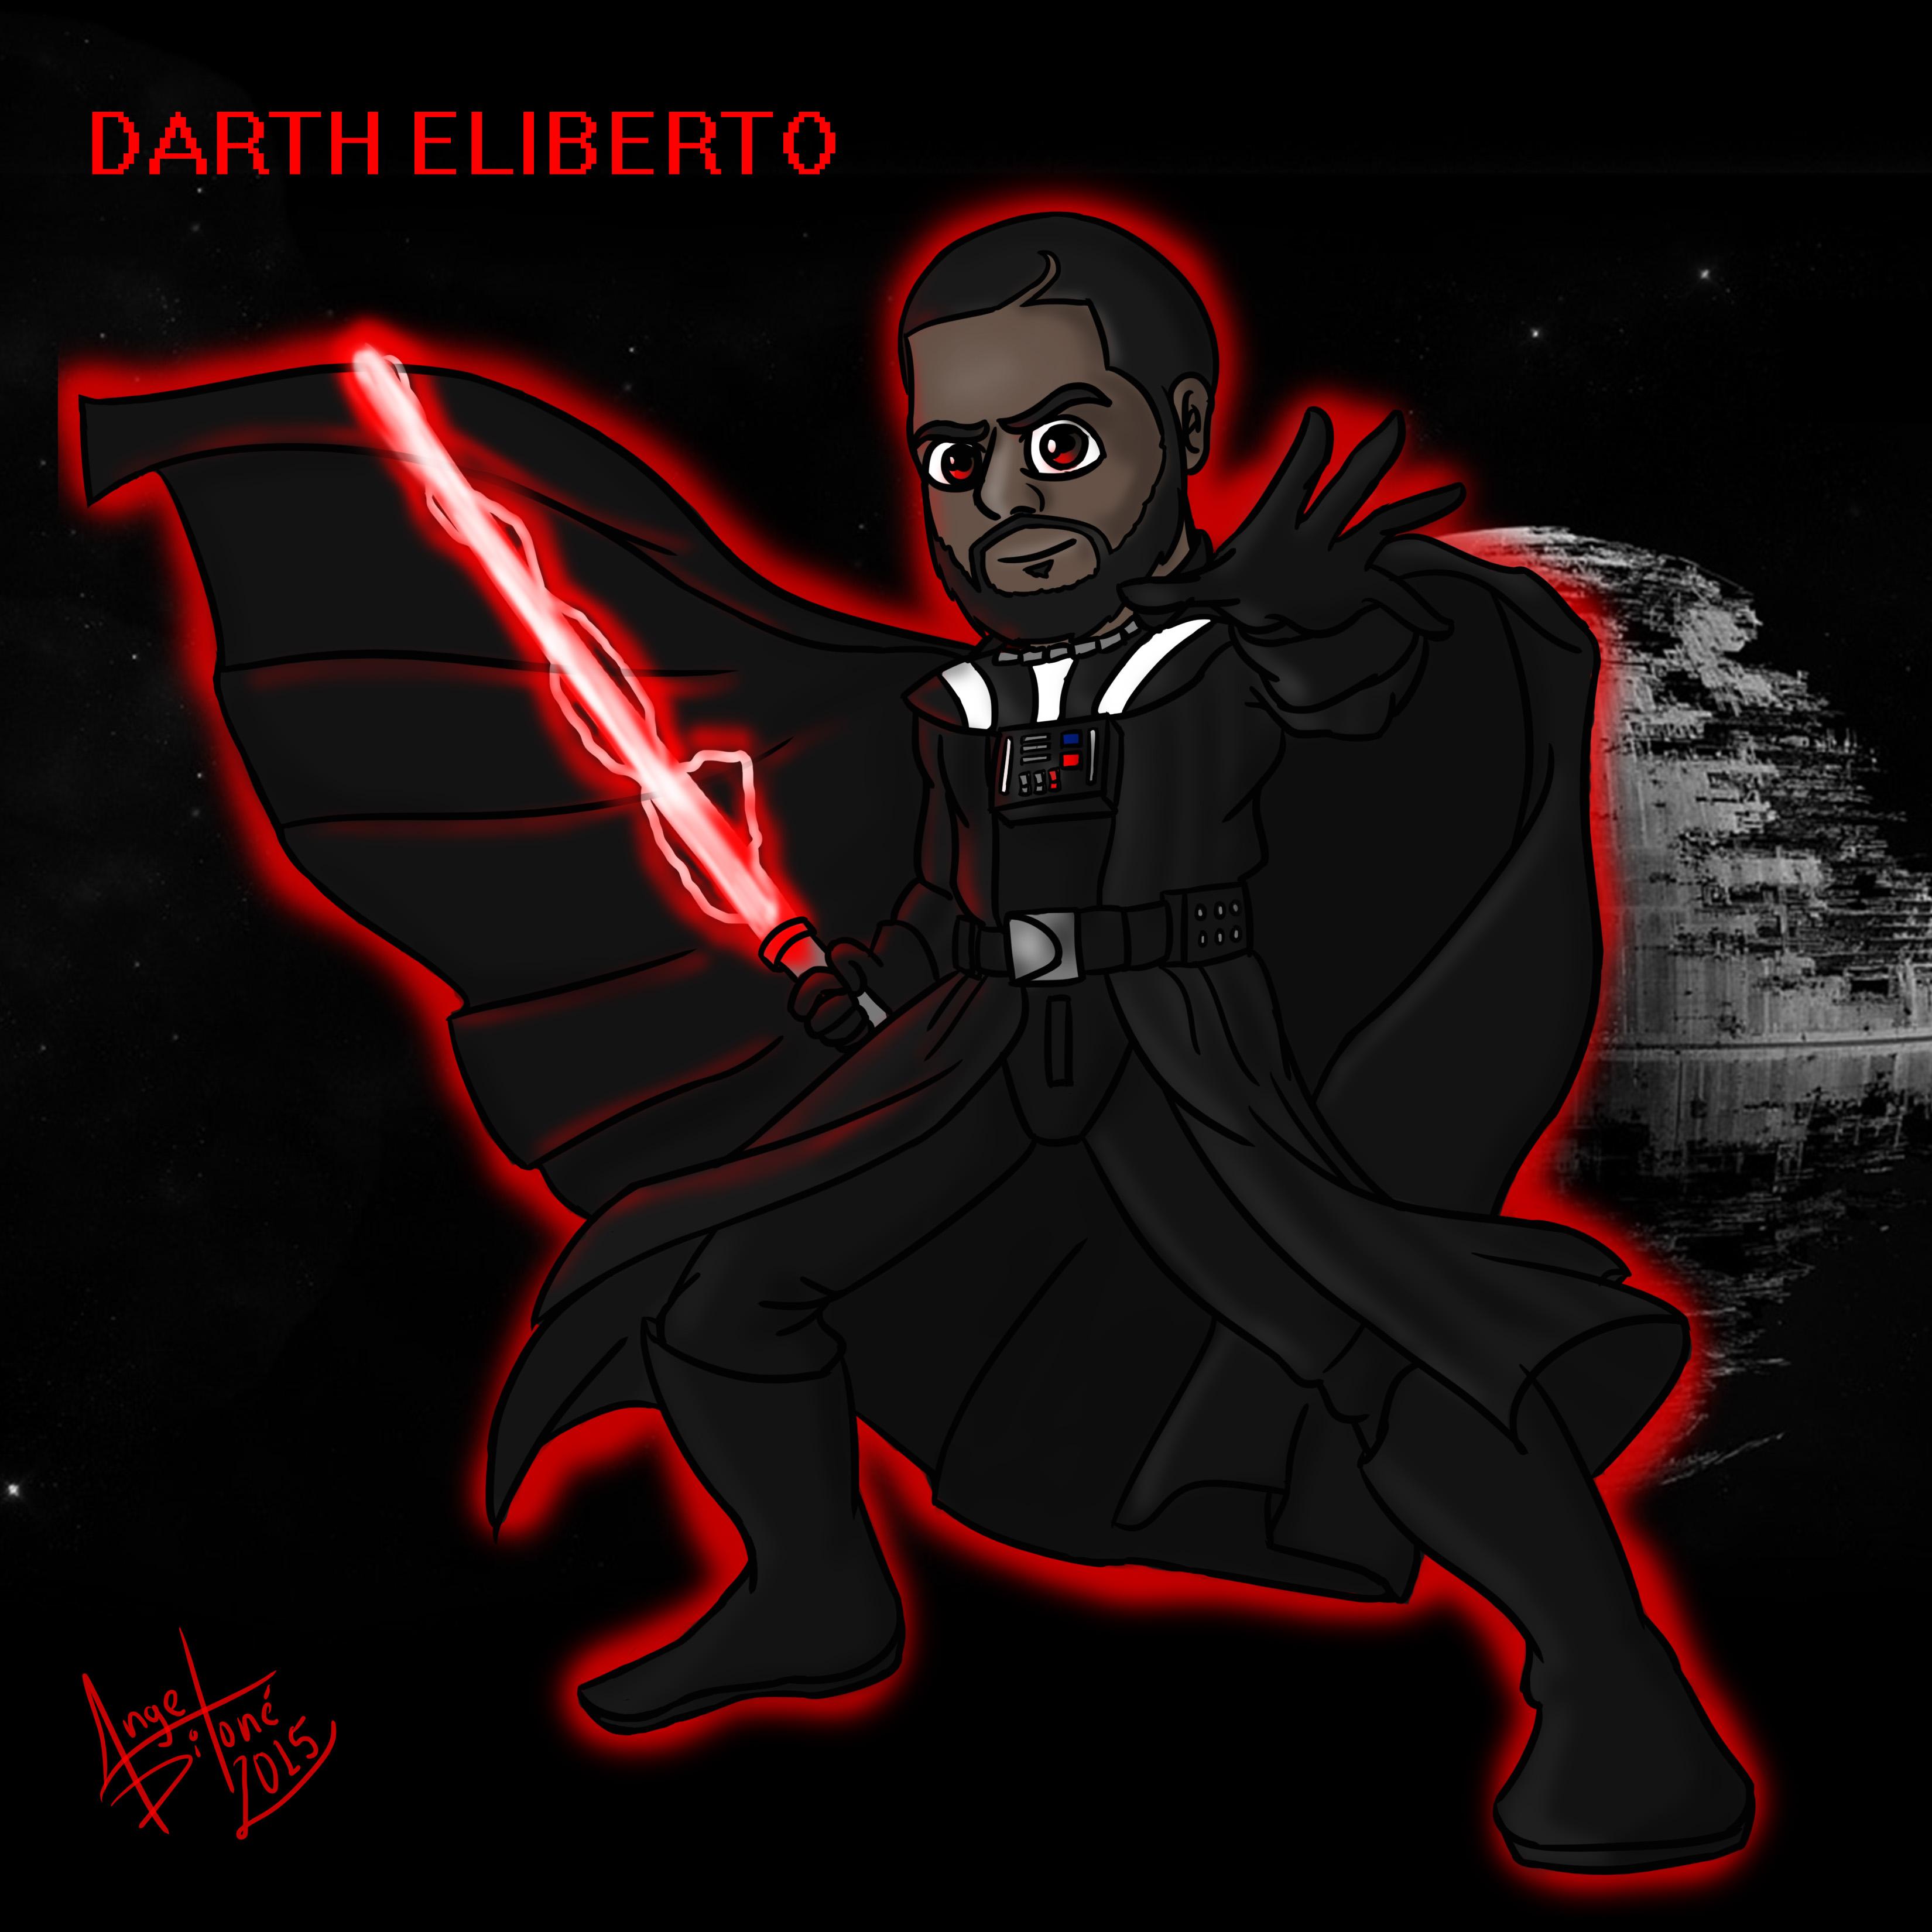 Darth ELiberto